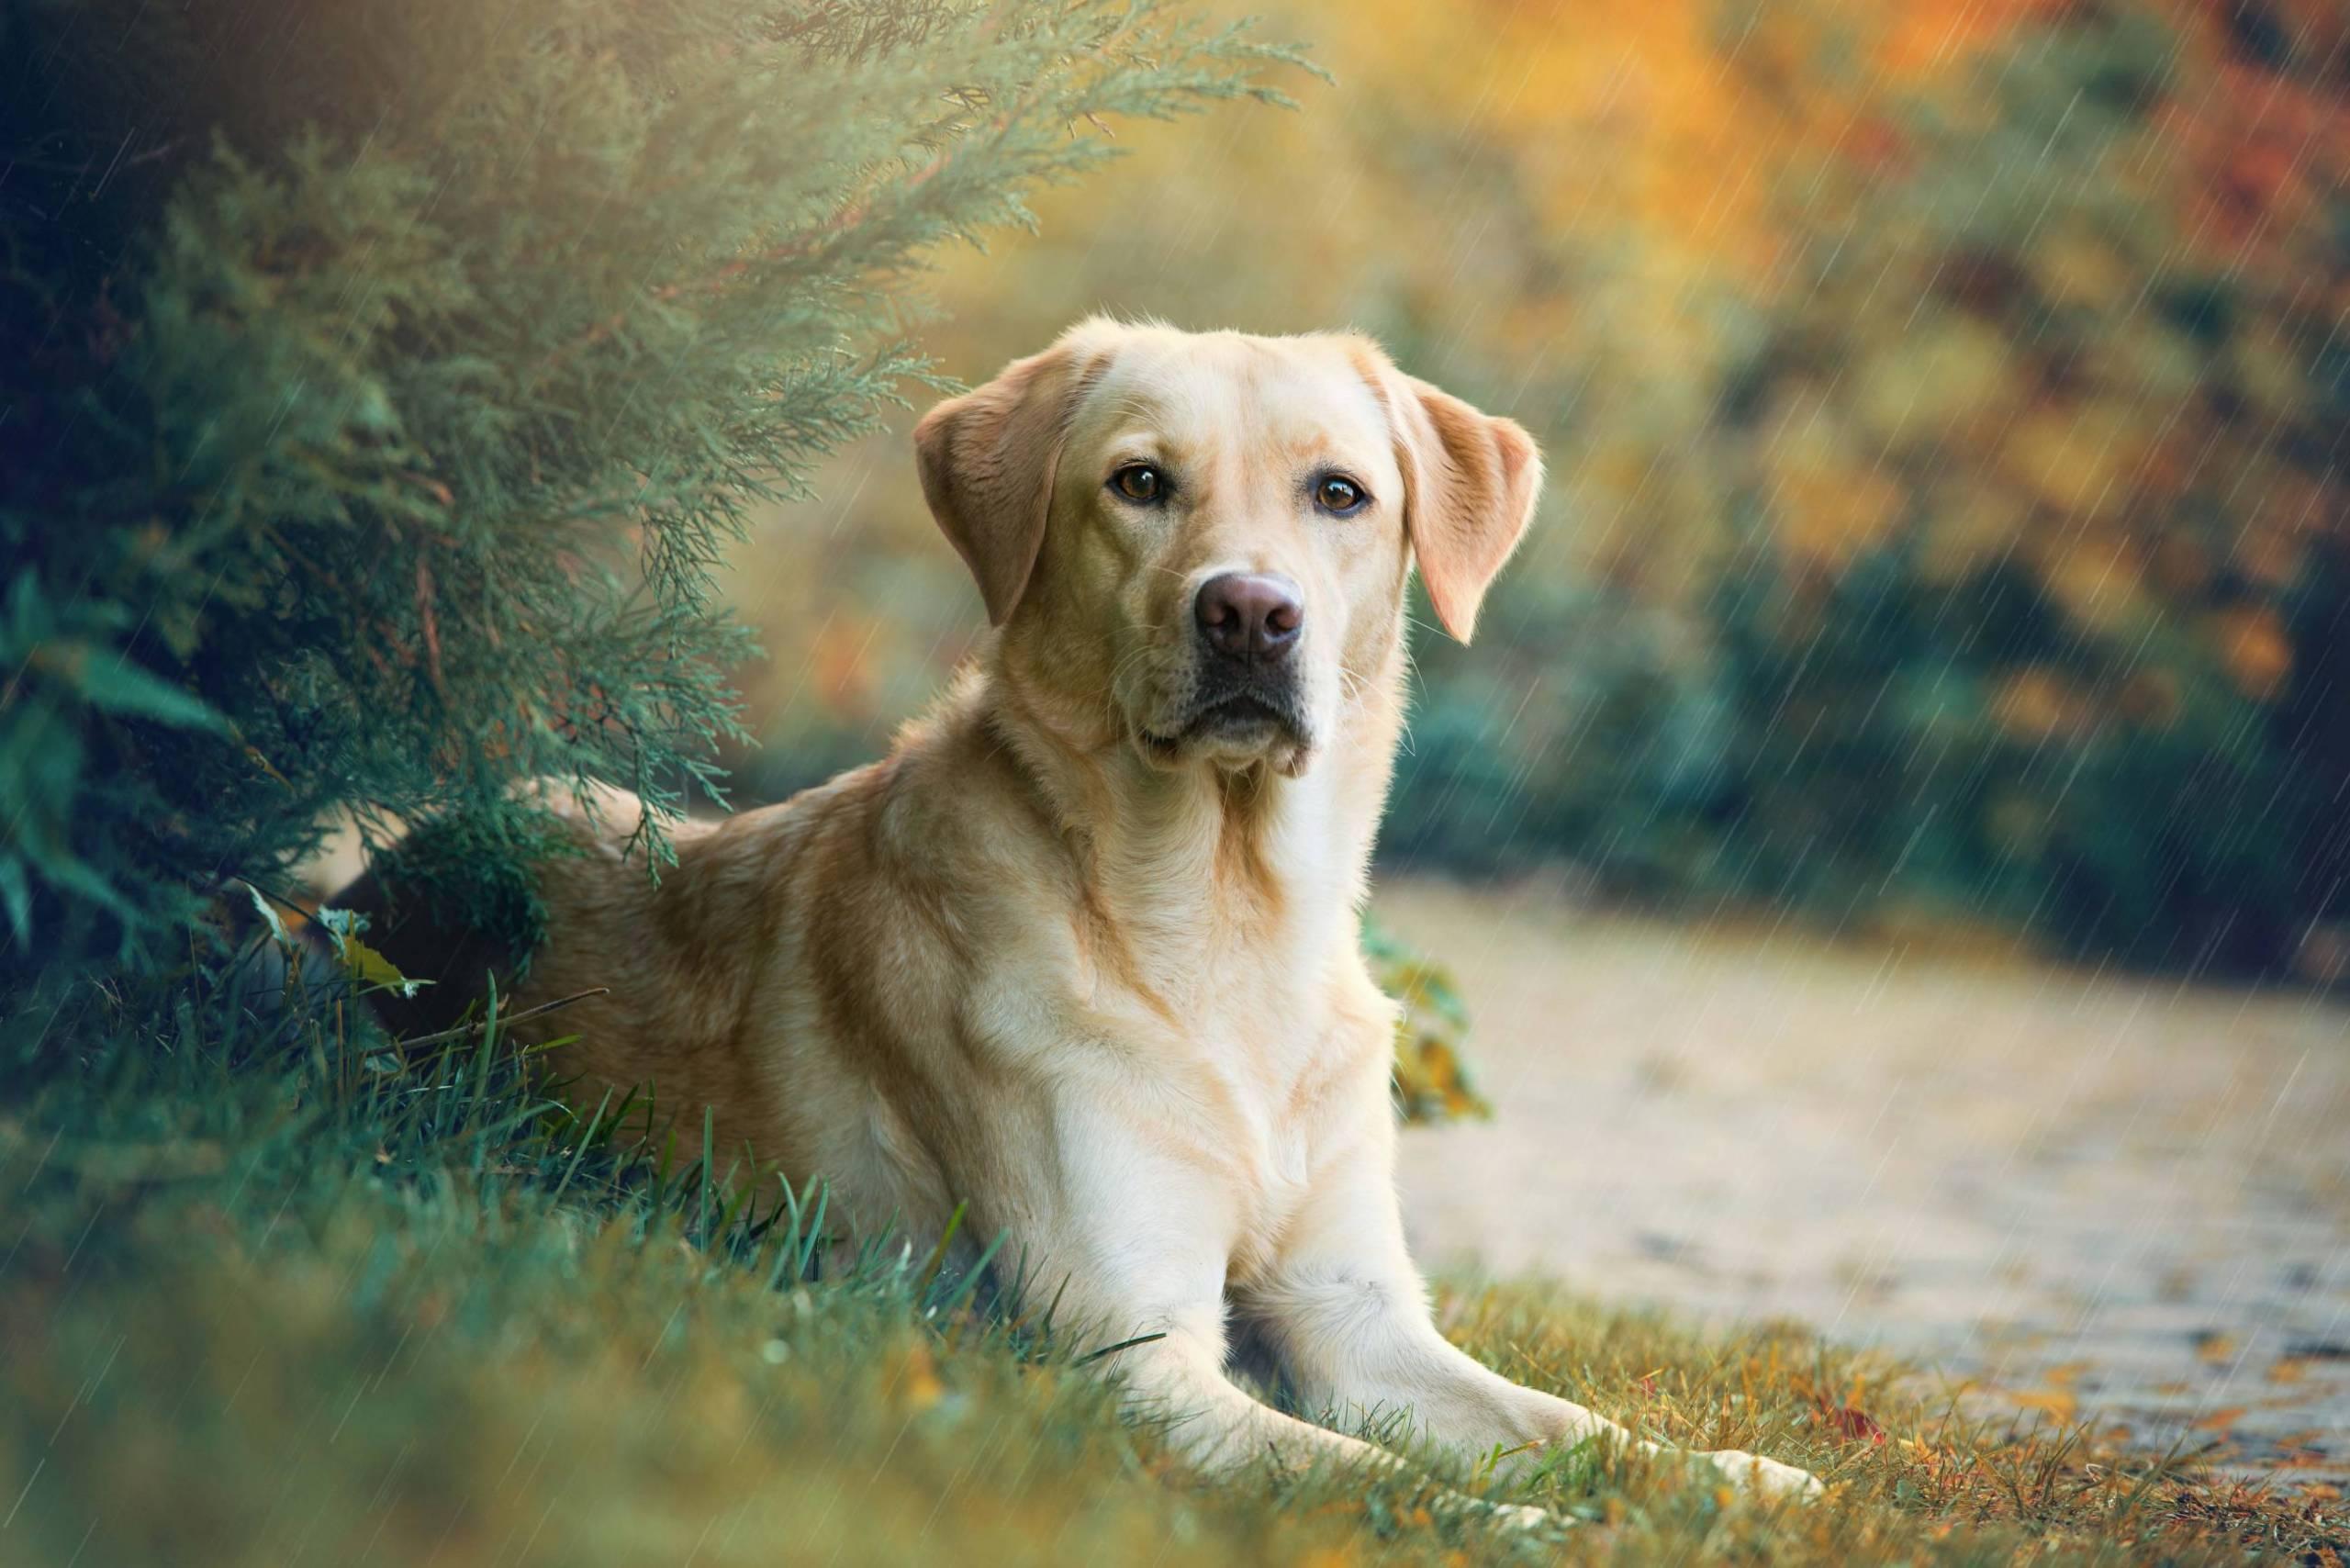 yellow labrador retriever sitting on grass with ears perked